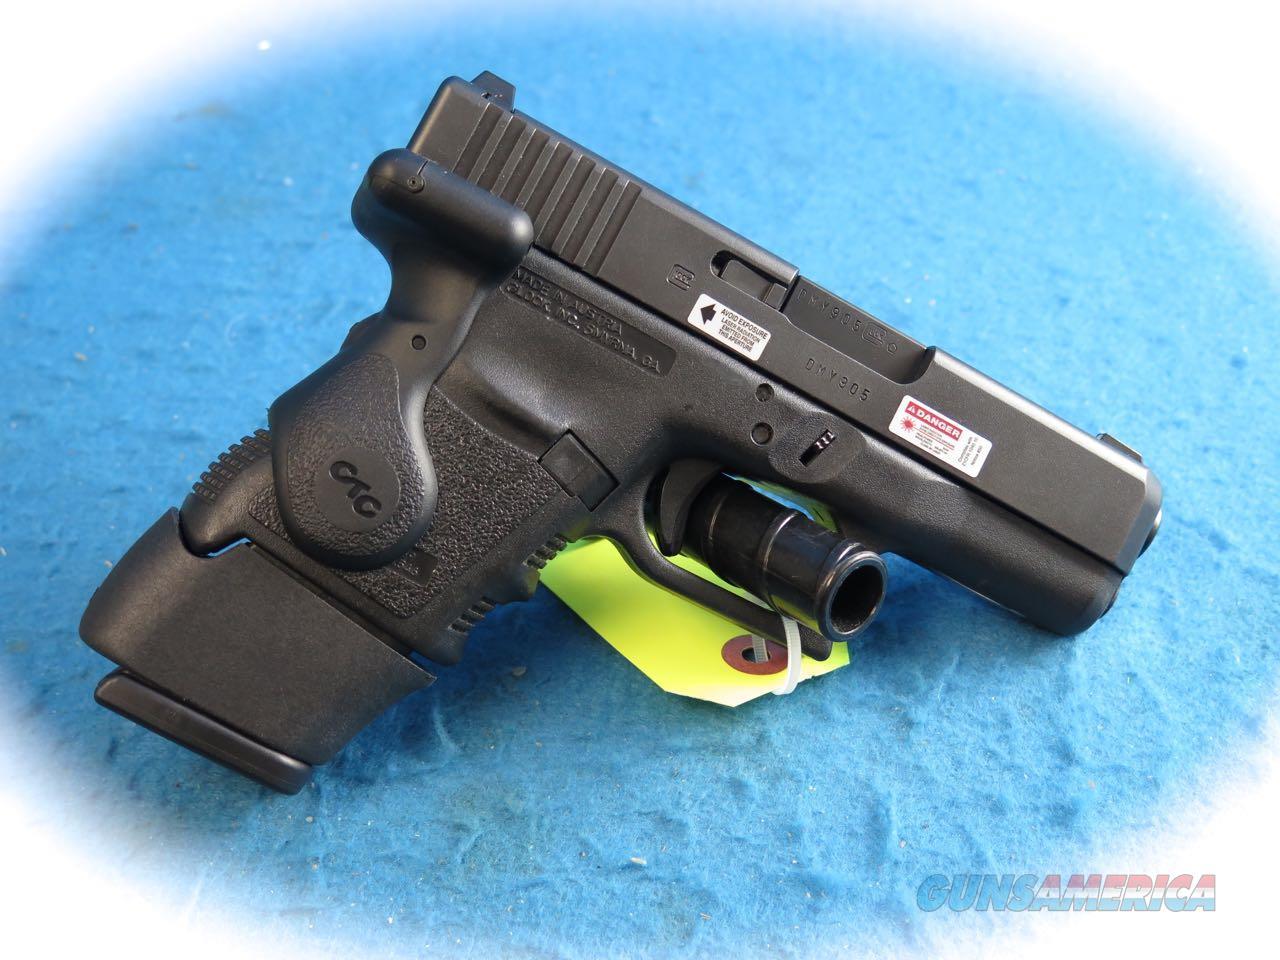 Glock Model 30 Gen 3 .45 ACP Pistol W/CTC Laser **Used**  Guns > Pistols > Glock Pistols > 29/30/36